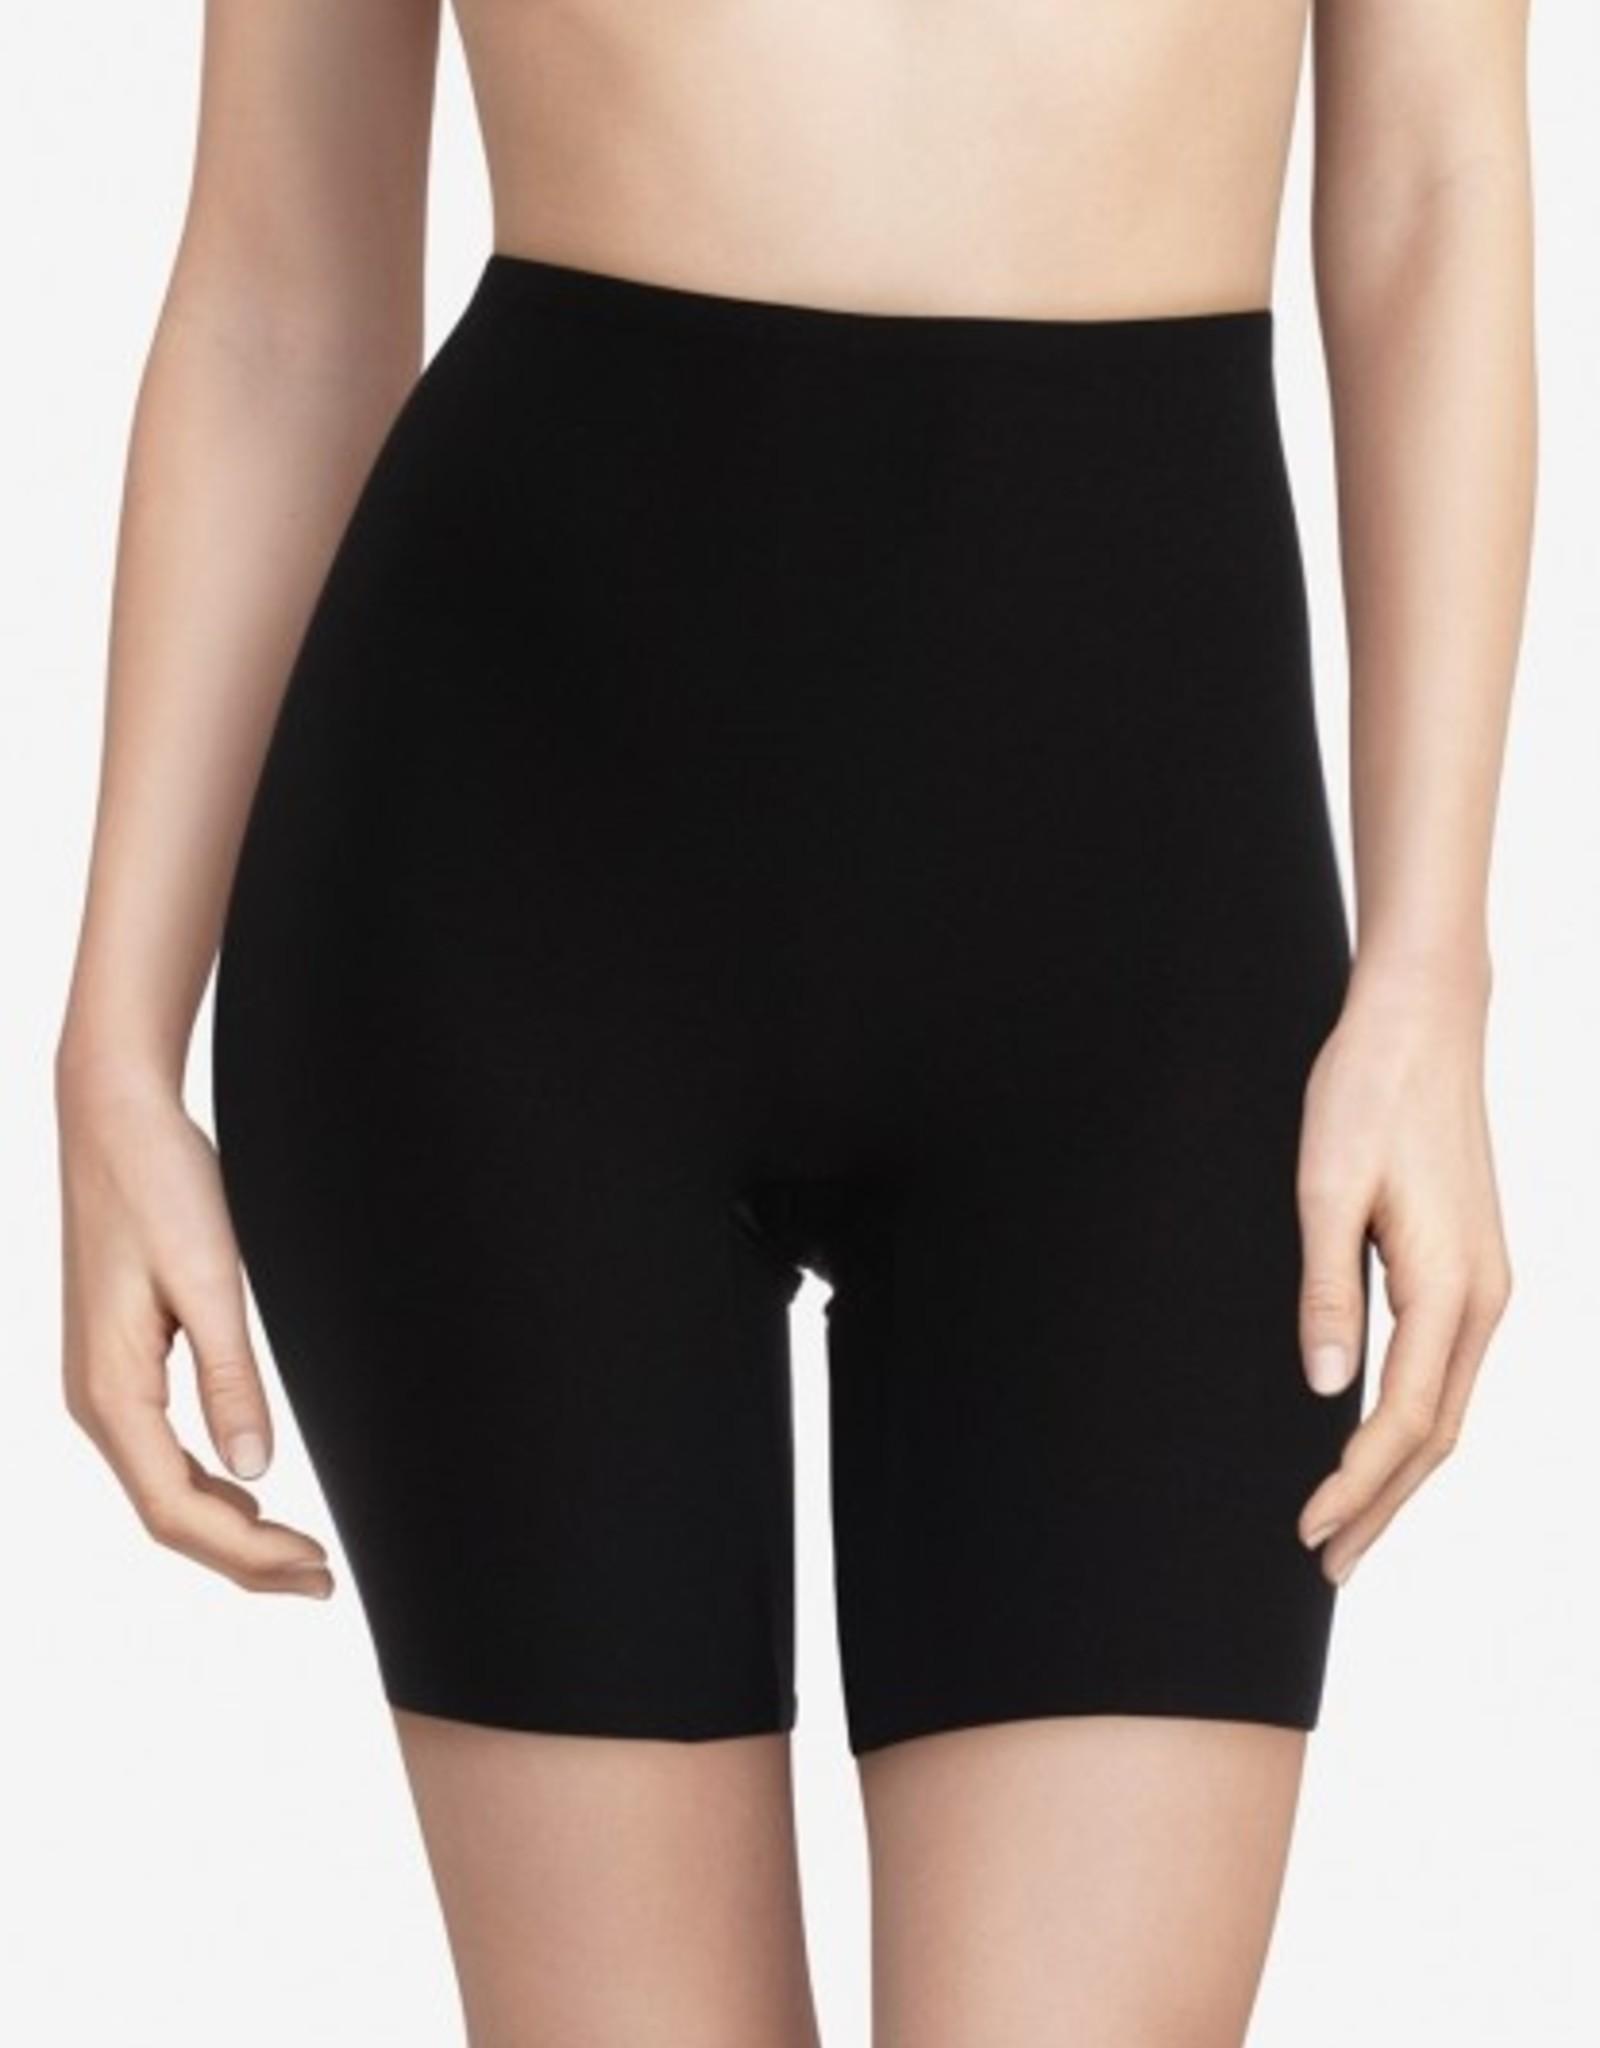 Chantelle Soft Stretch: Shorts 2645